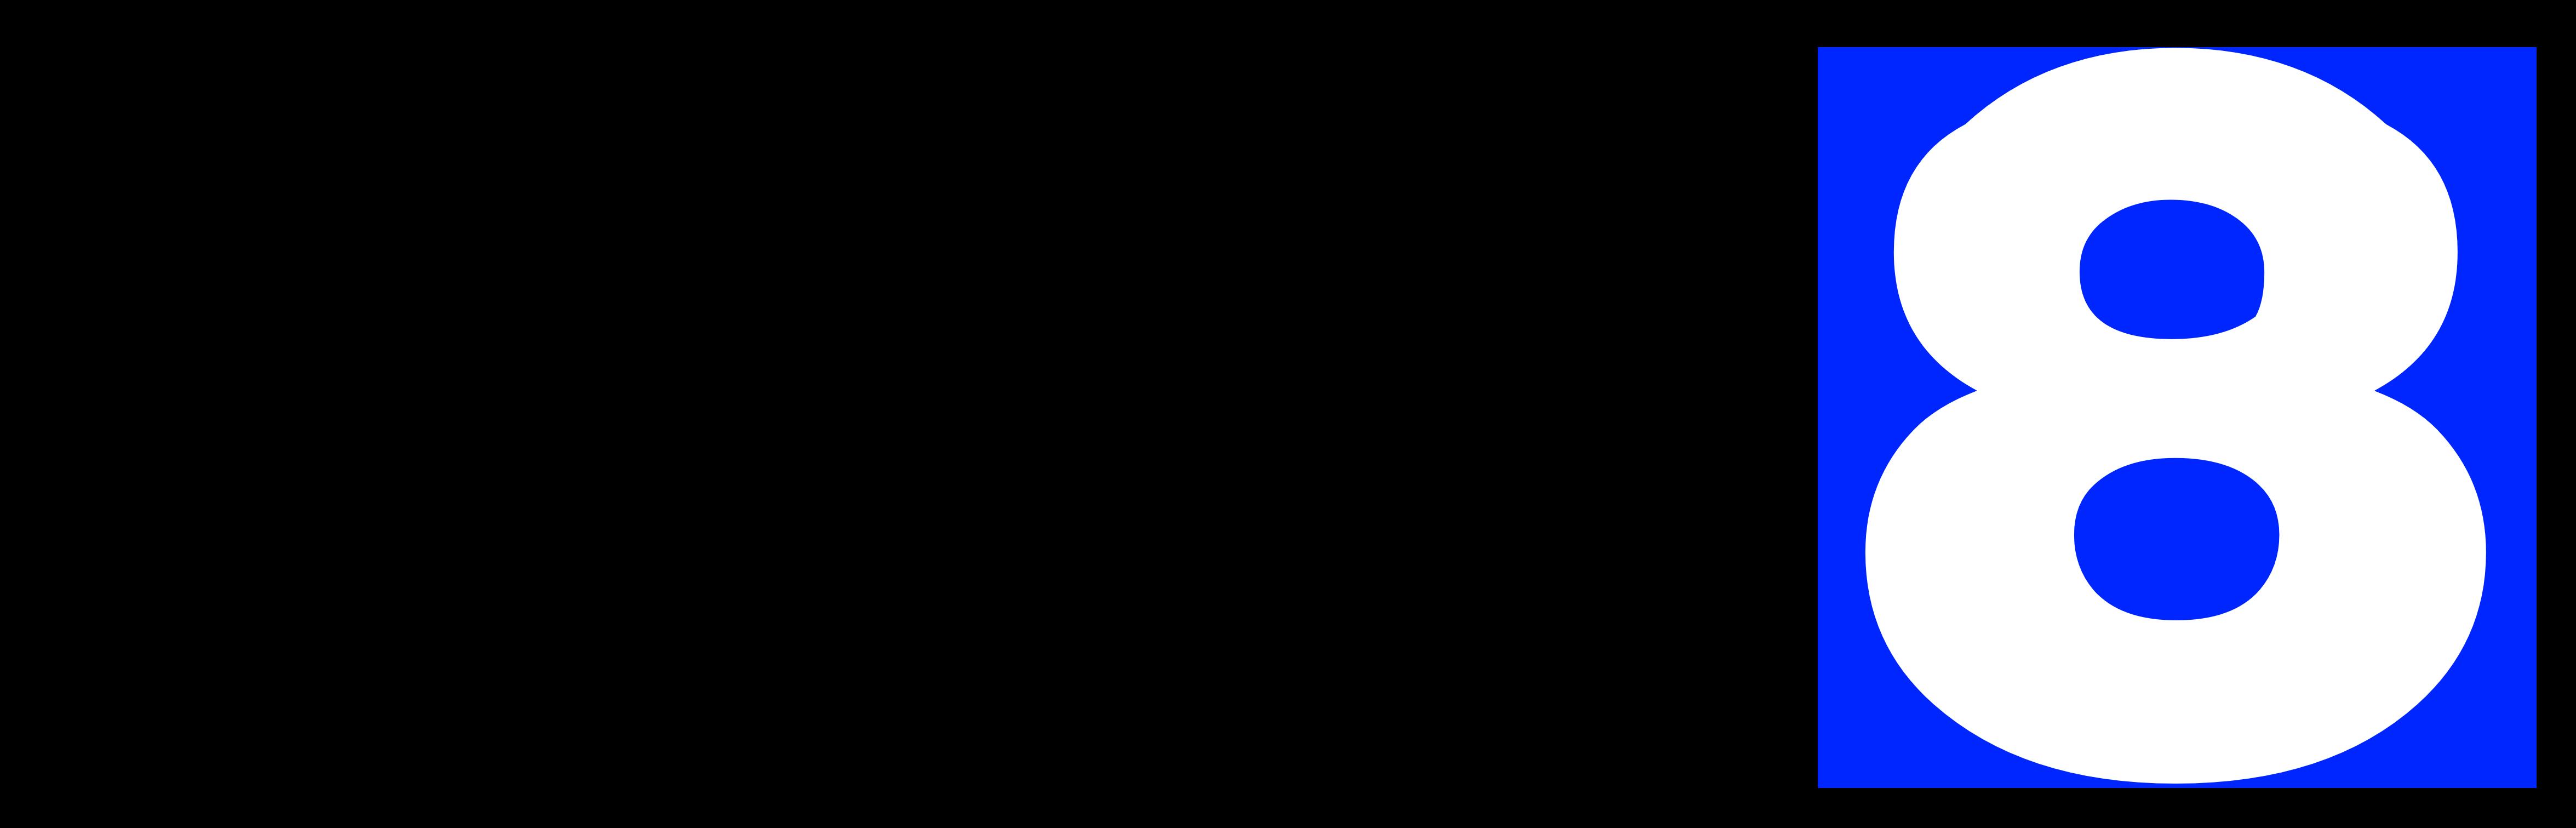 AlternateHistory.com's WKBT logo #1.png